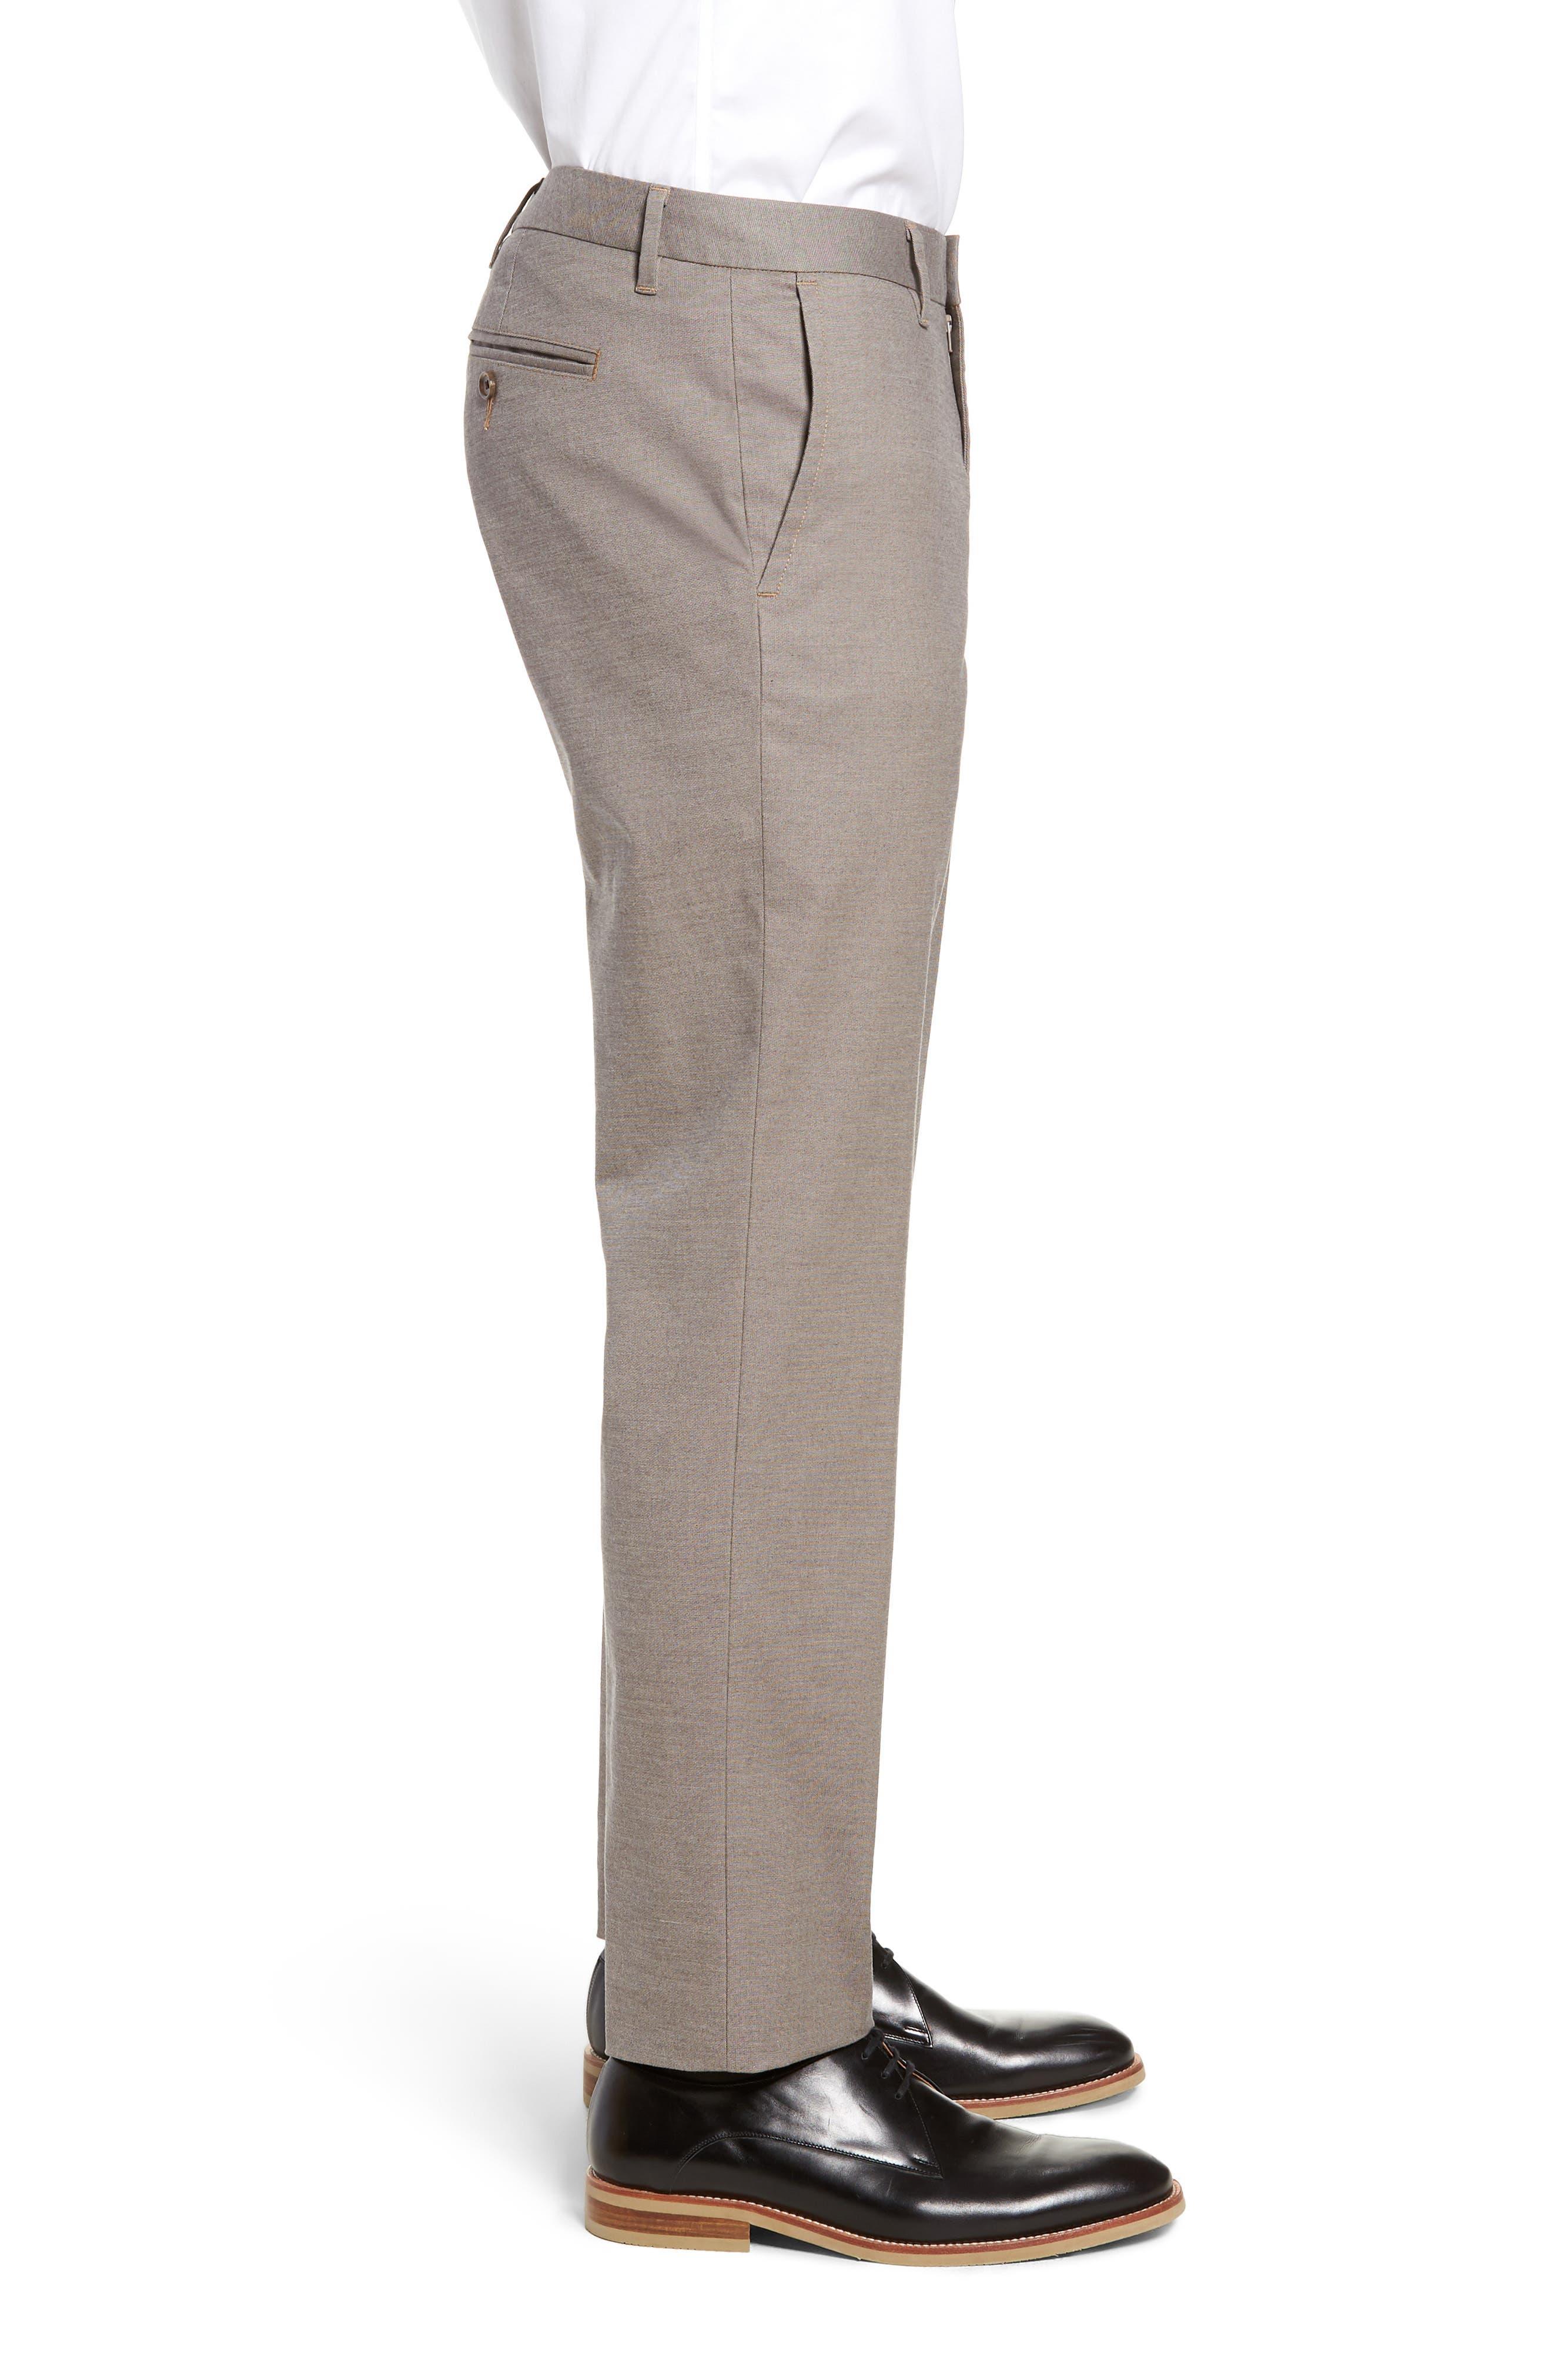 BONOBOS, Weekday Warrior Slim Fit Stretch Dress Pants, Alternate thumbnail 4, color, LIGHT KHAKI YARN DYE